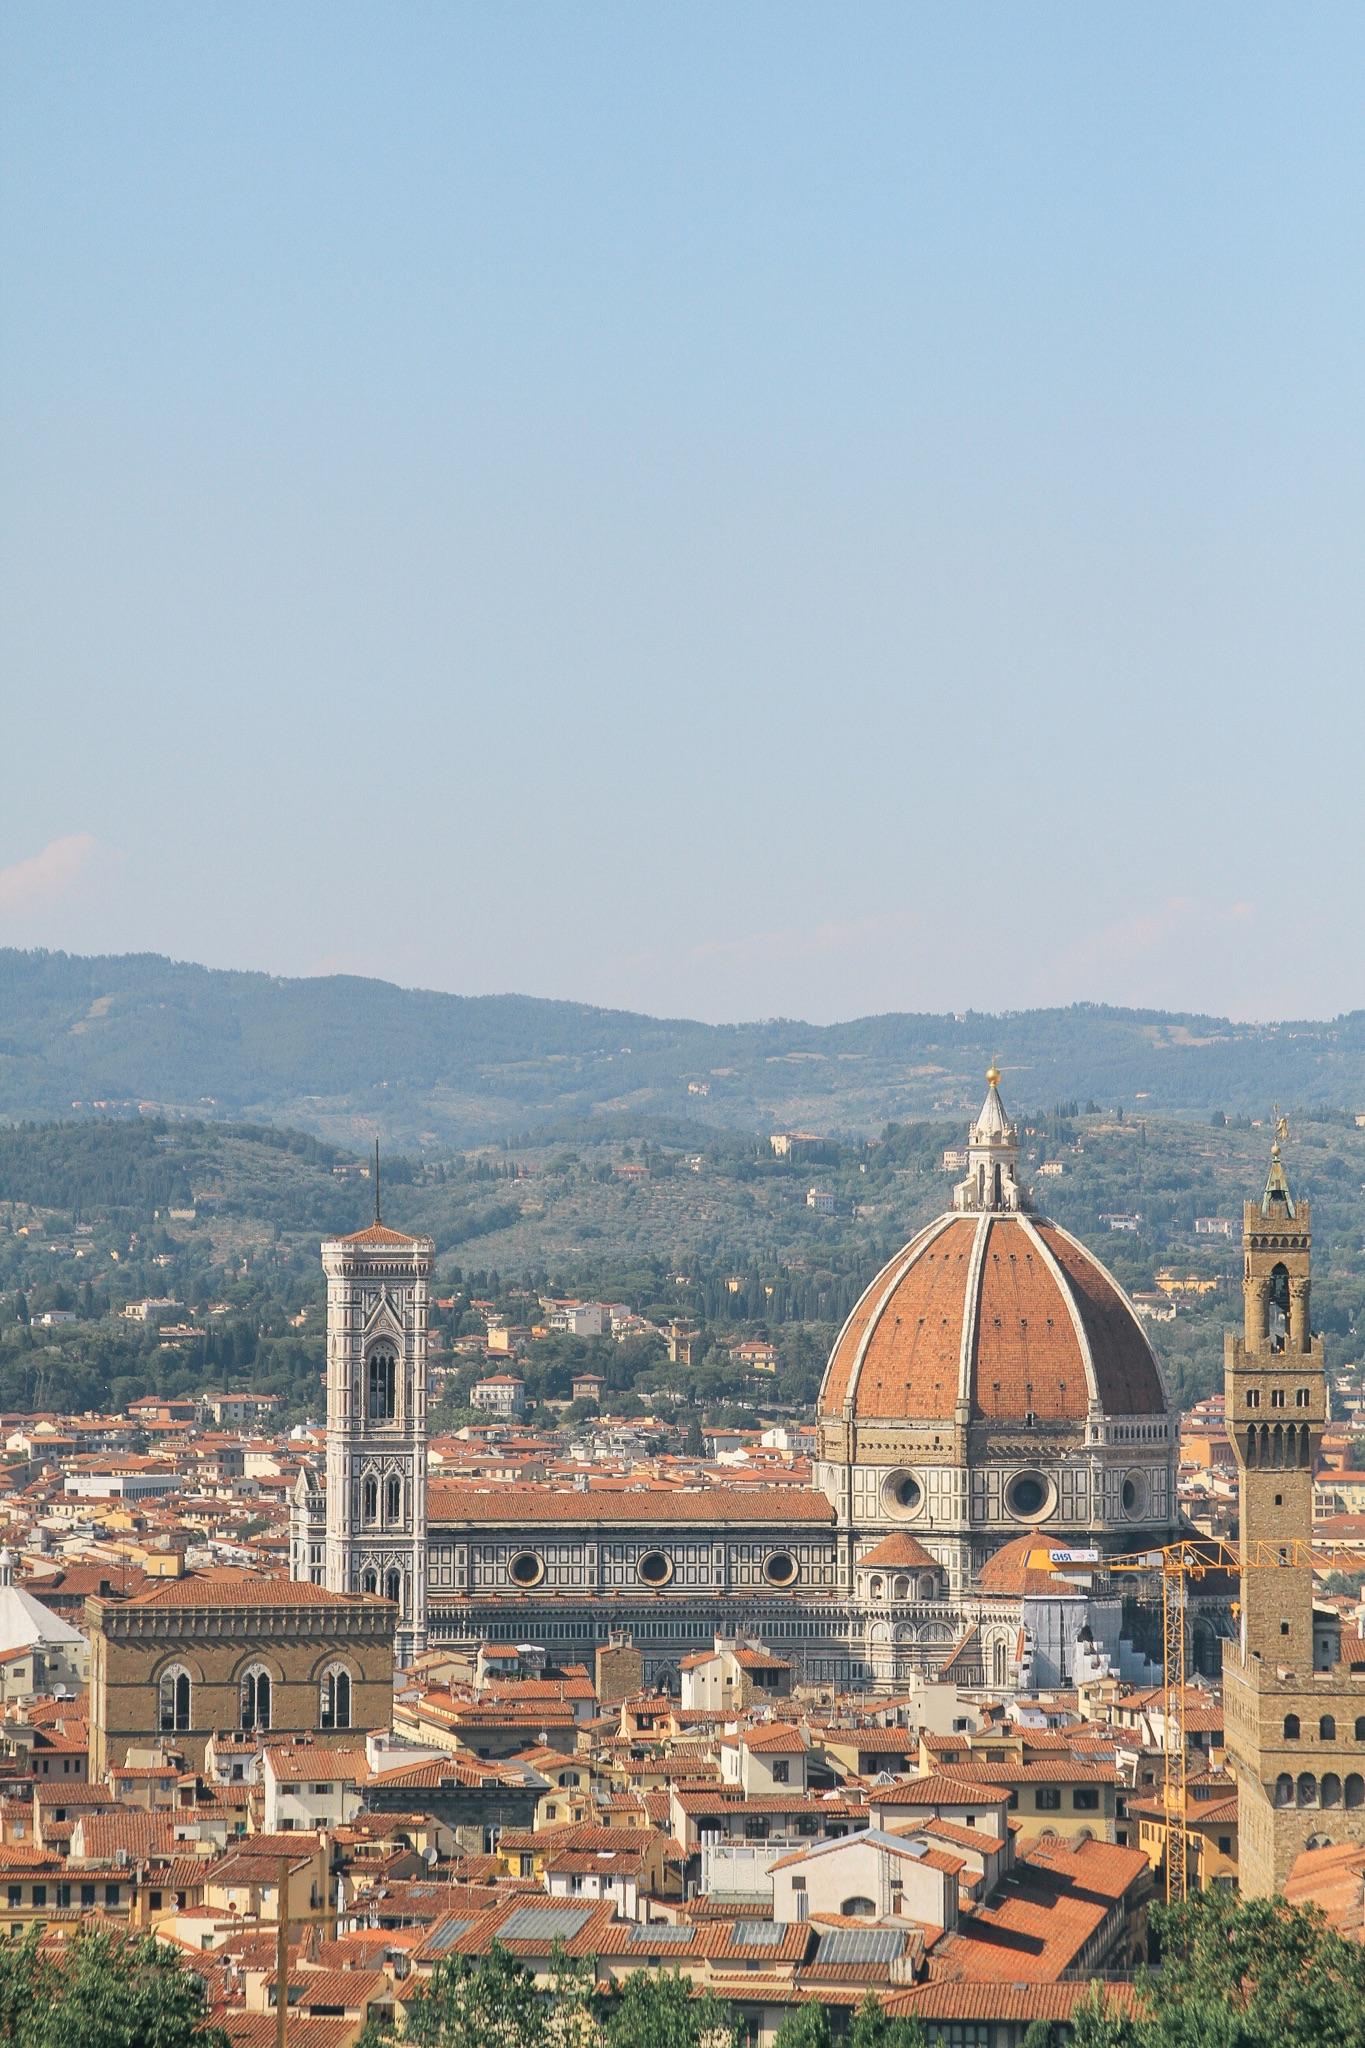 Ten-Days-Florence-Tuscany-Travel-Guide-MonicaFrancis-1